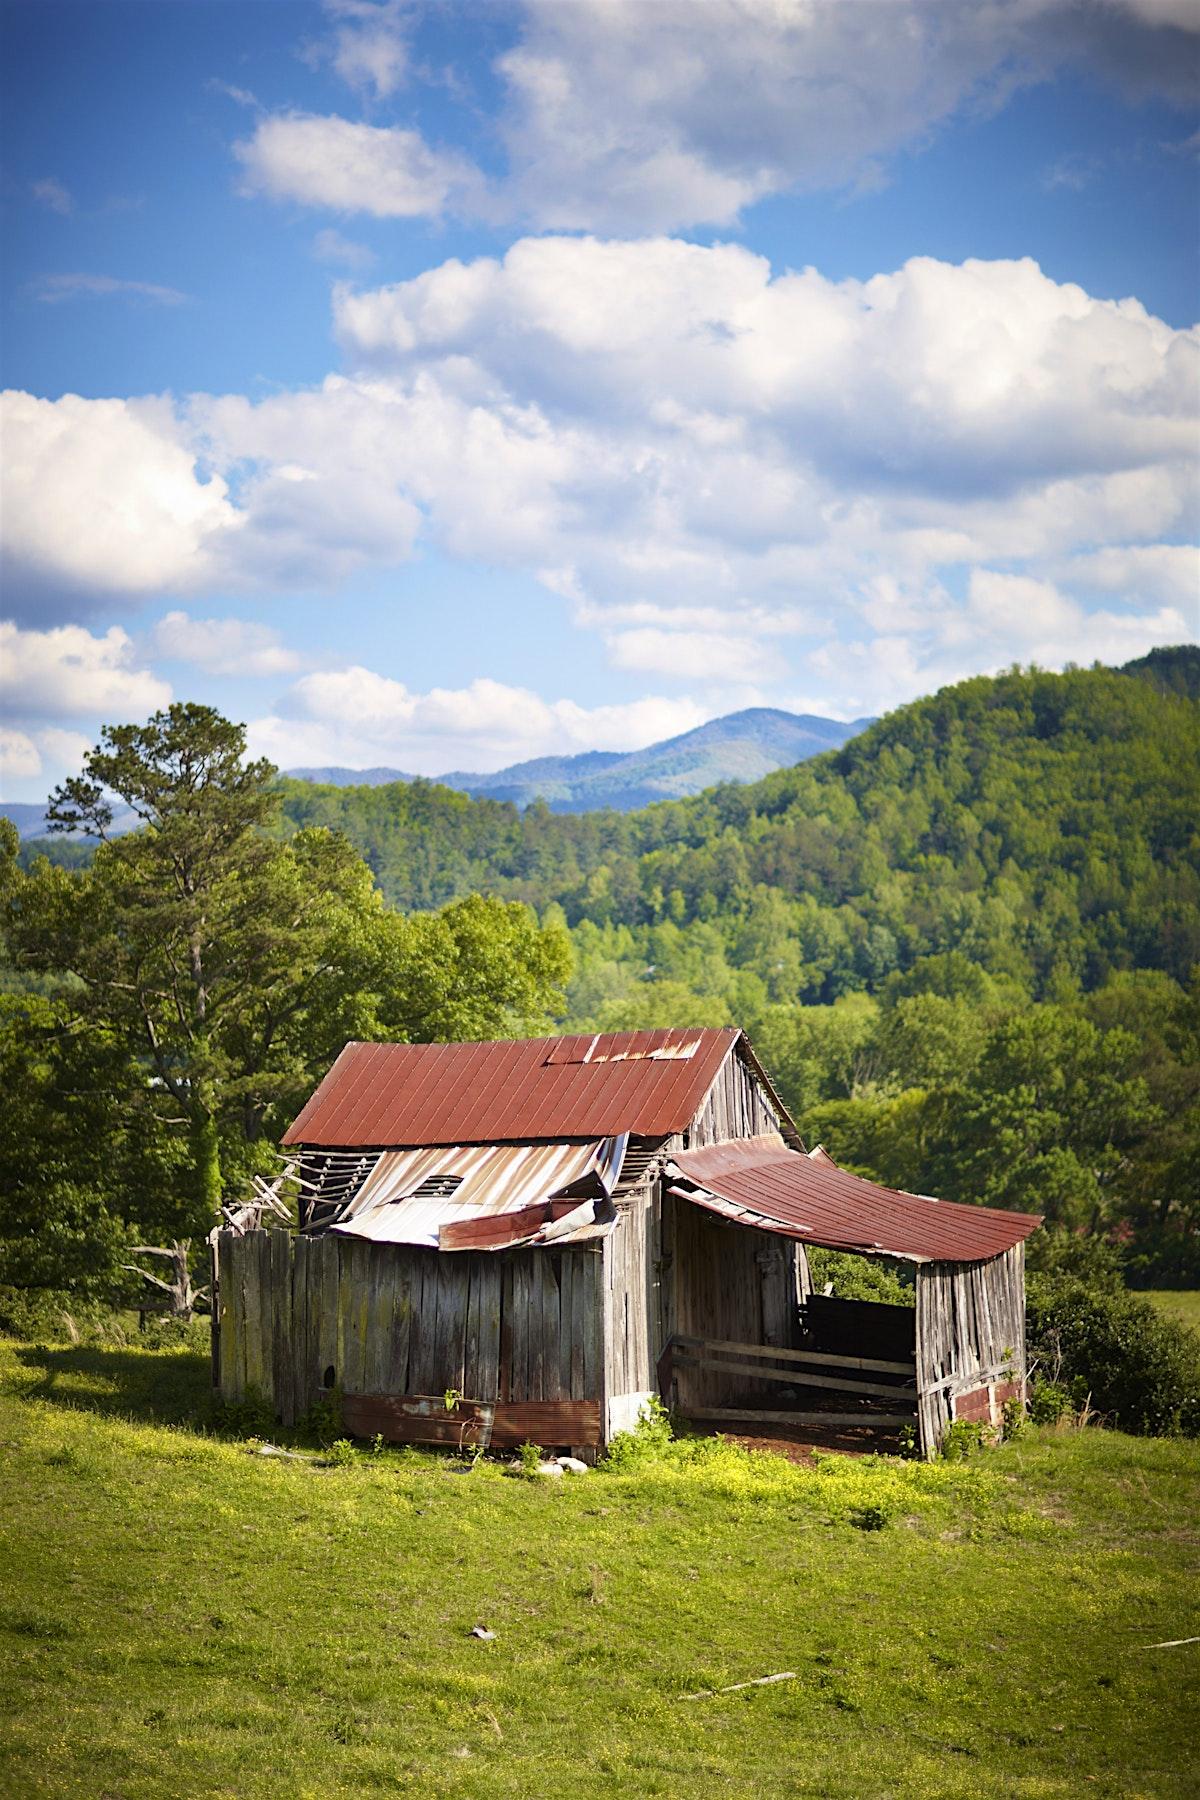 Blue Ridge Highlands Amp Southwest Virginia Travel Virginia Usa Lonely Planet